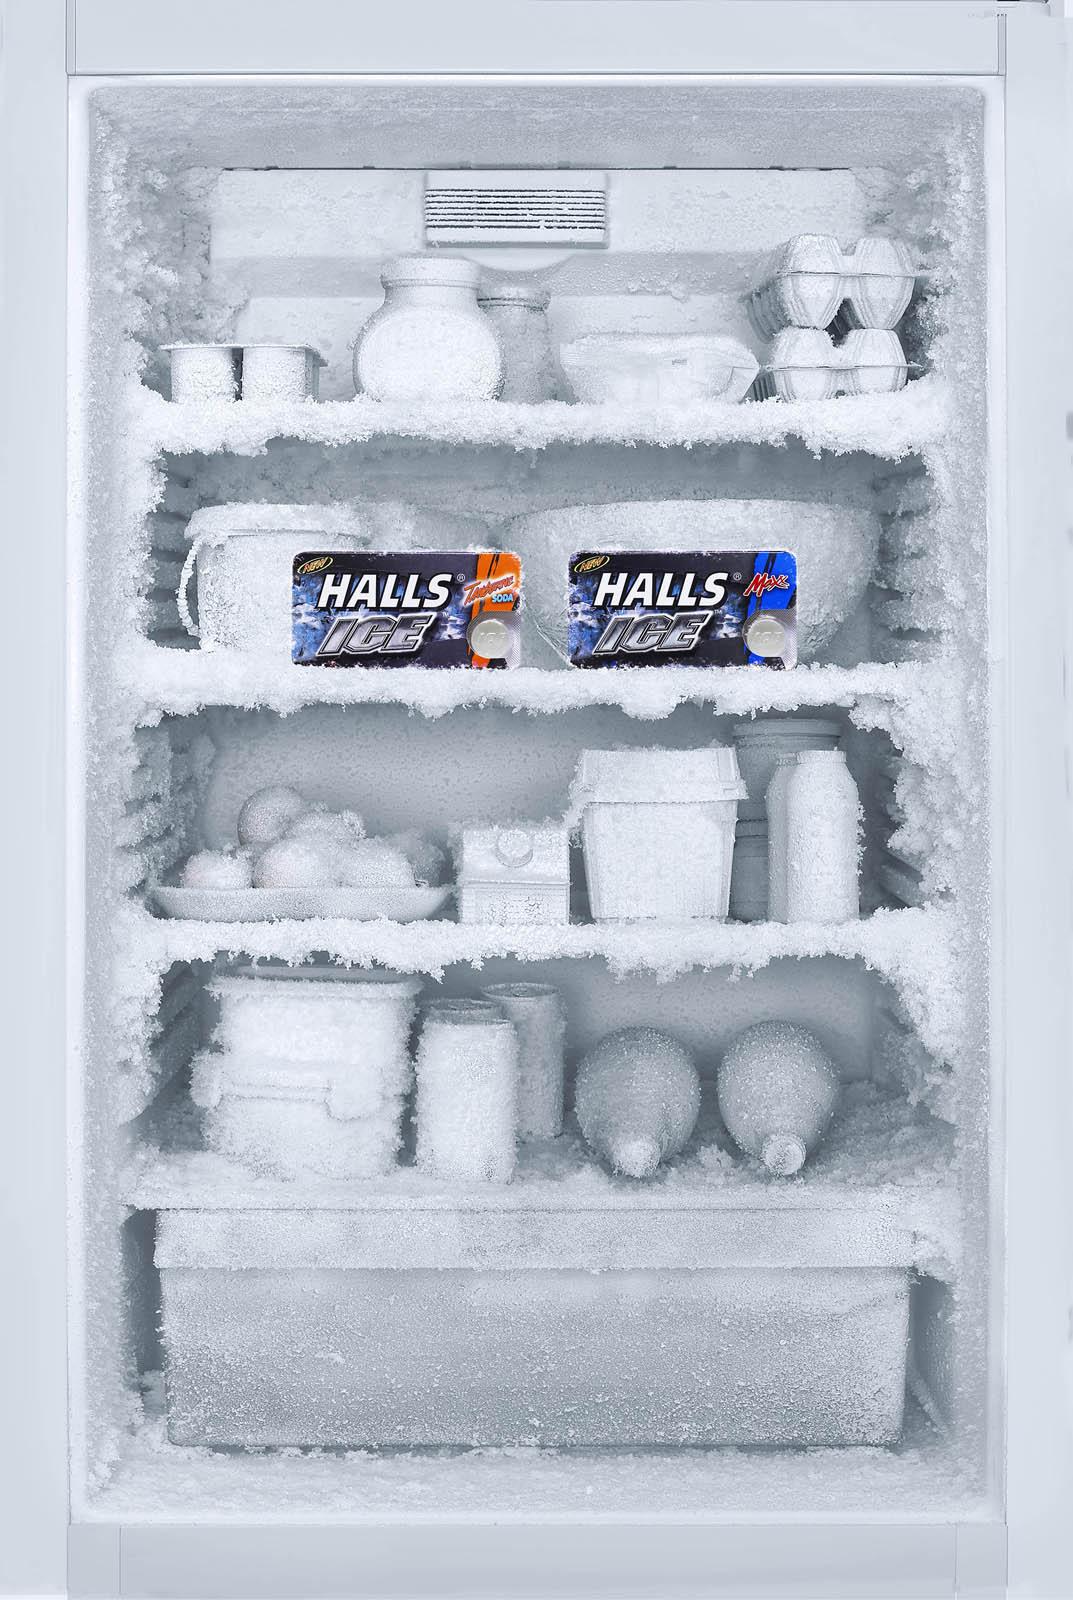 Halls(Resize).jpg